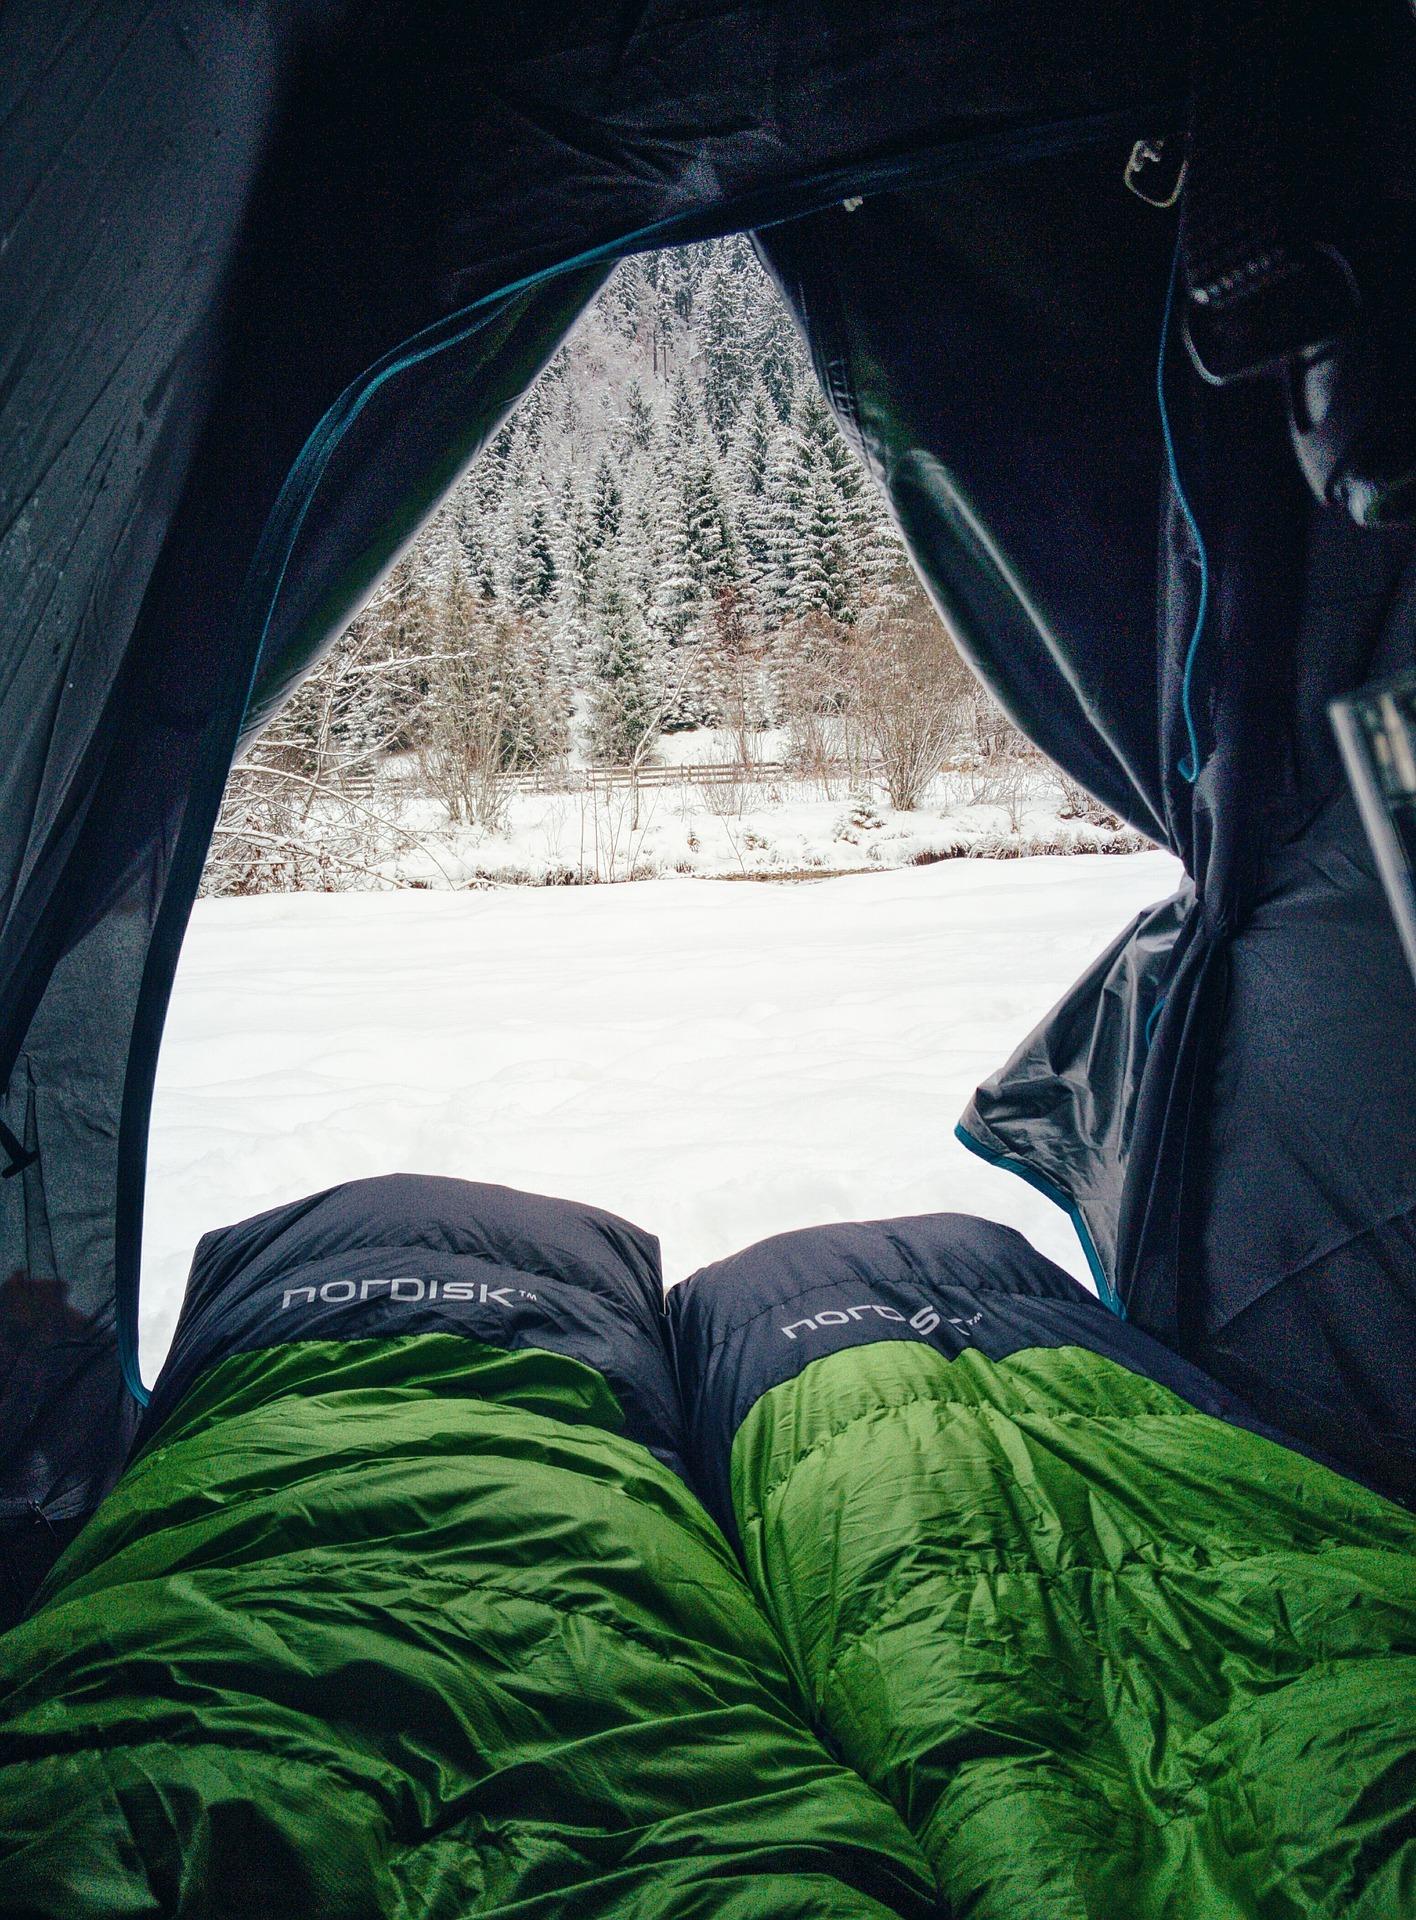 Coleman Brazos 20 Degree Sleeping Bag Review